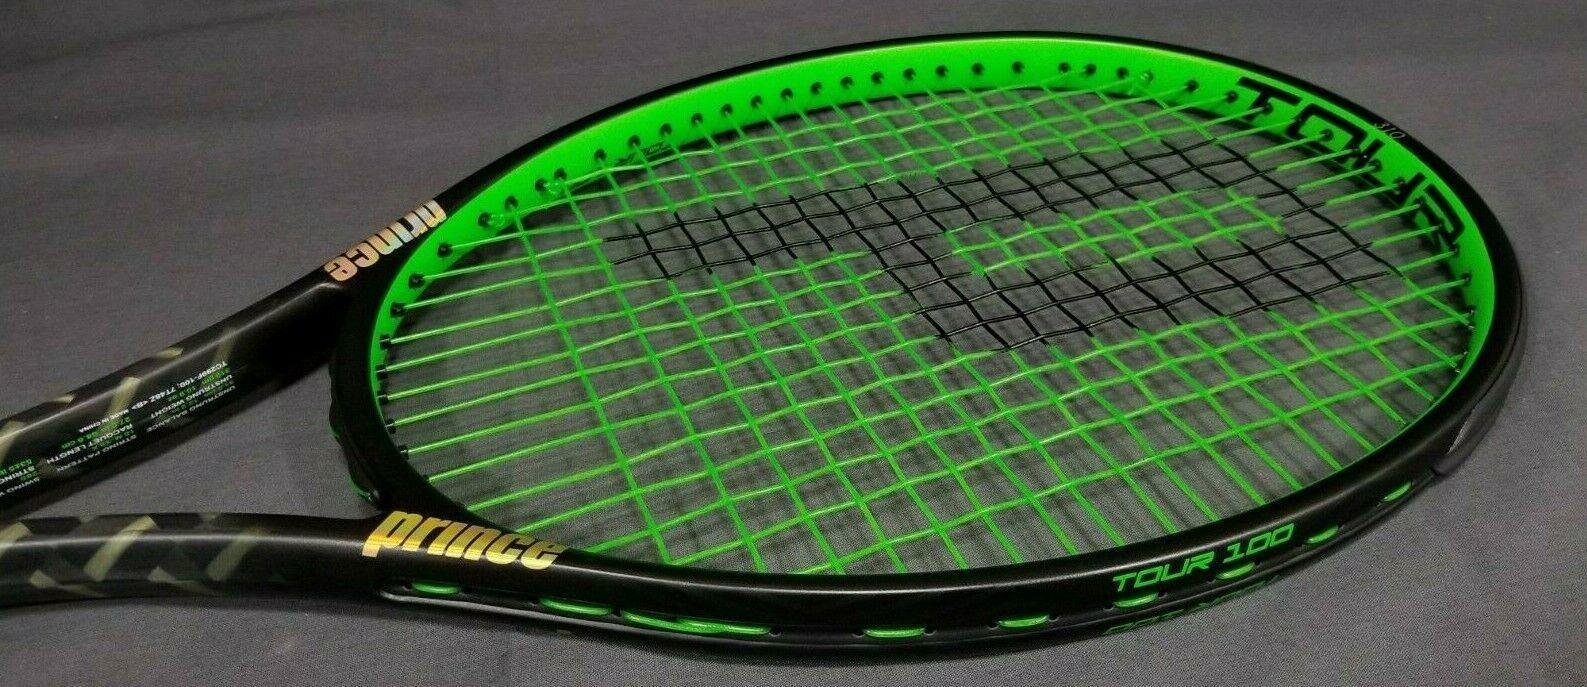 NEW Prince Textreme Tour 100P 2019 Tennis Racquet 4 1/4  Strung